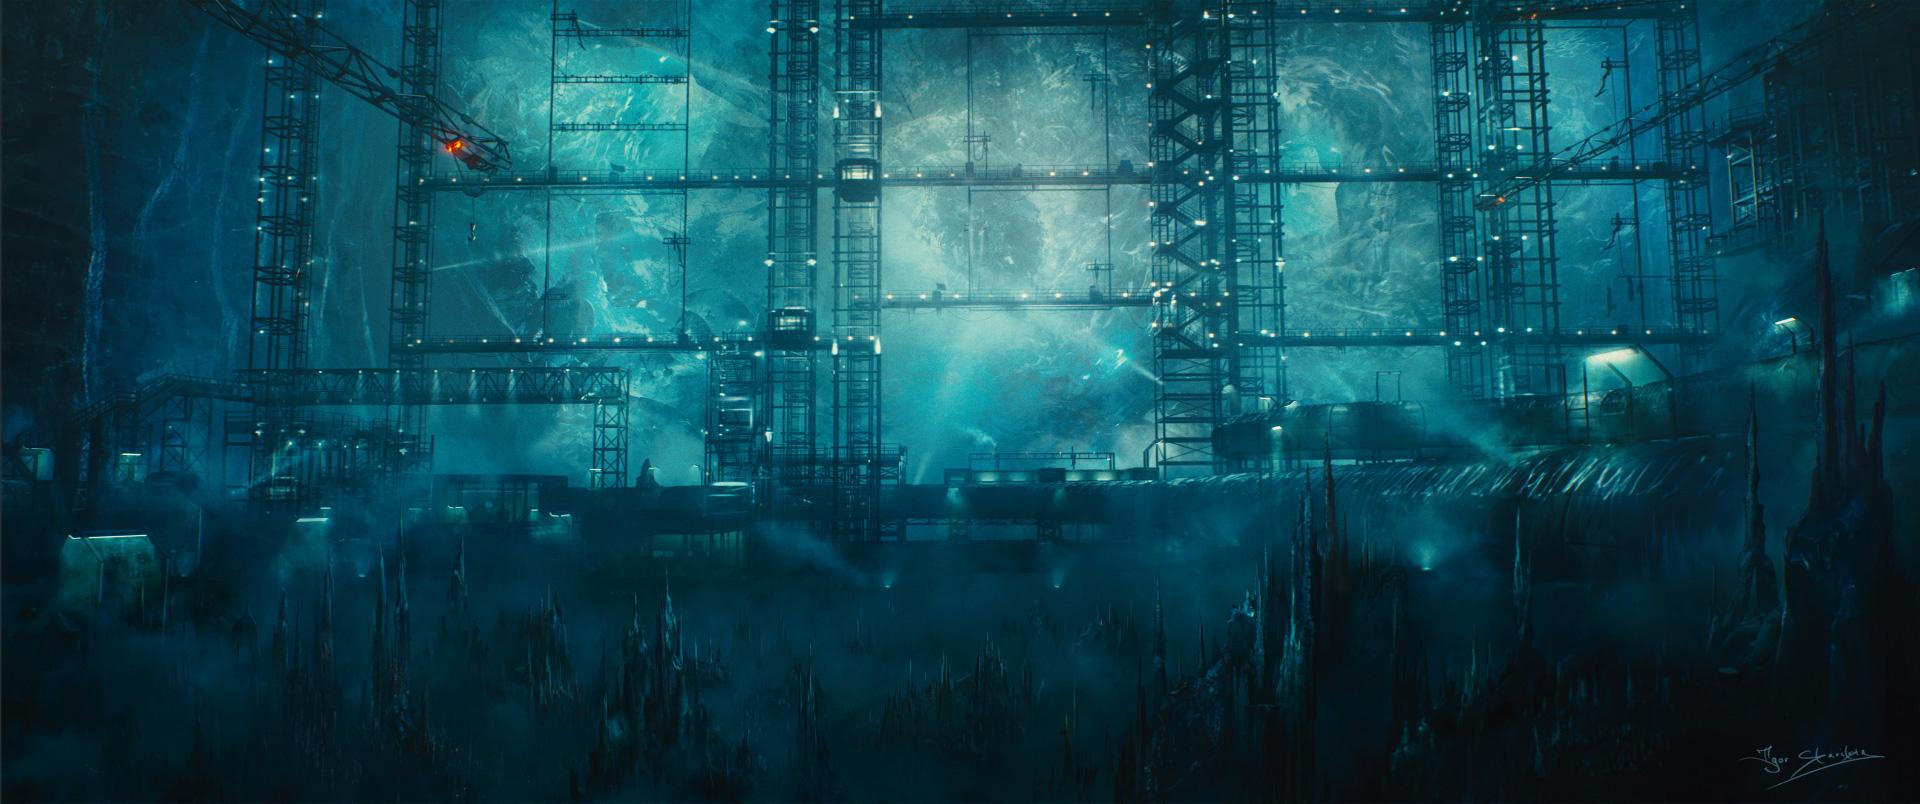 21.Godzilla5-ConceptArt.jpg